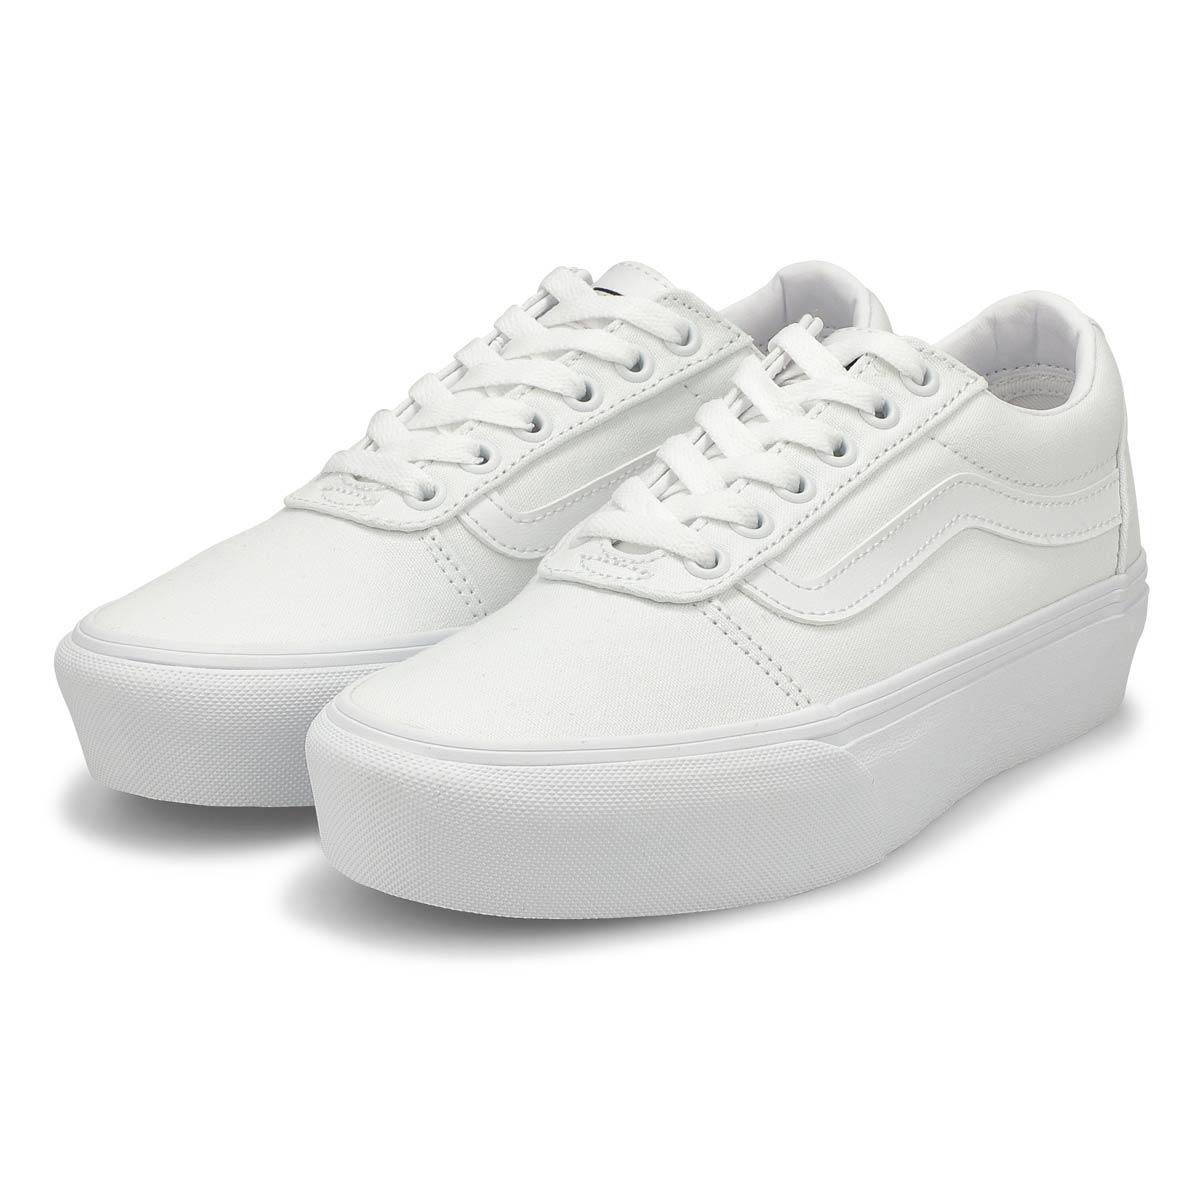 Women's Ward Platform Sneaker - White/White